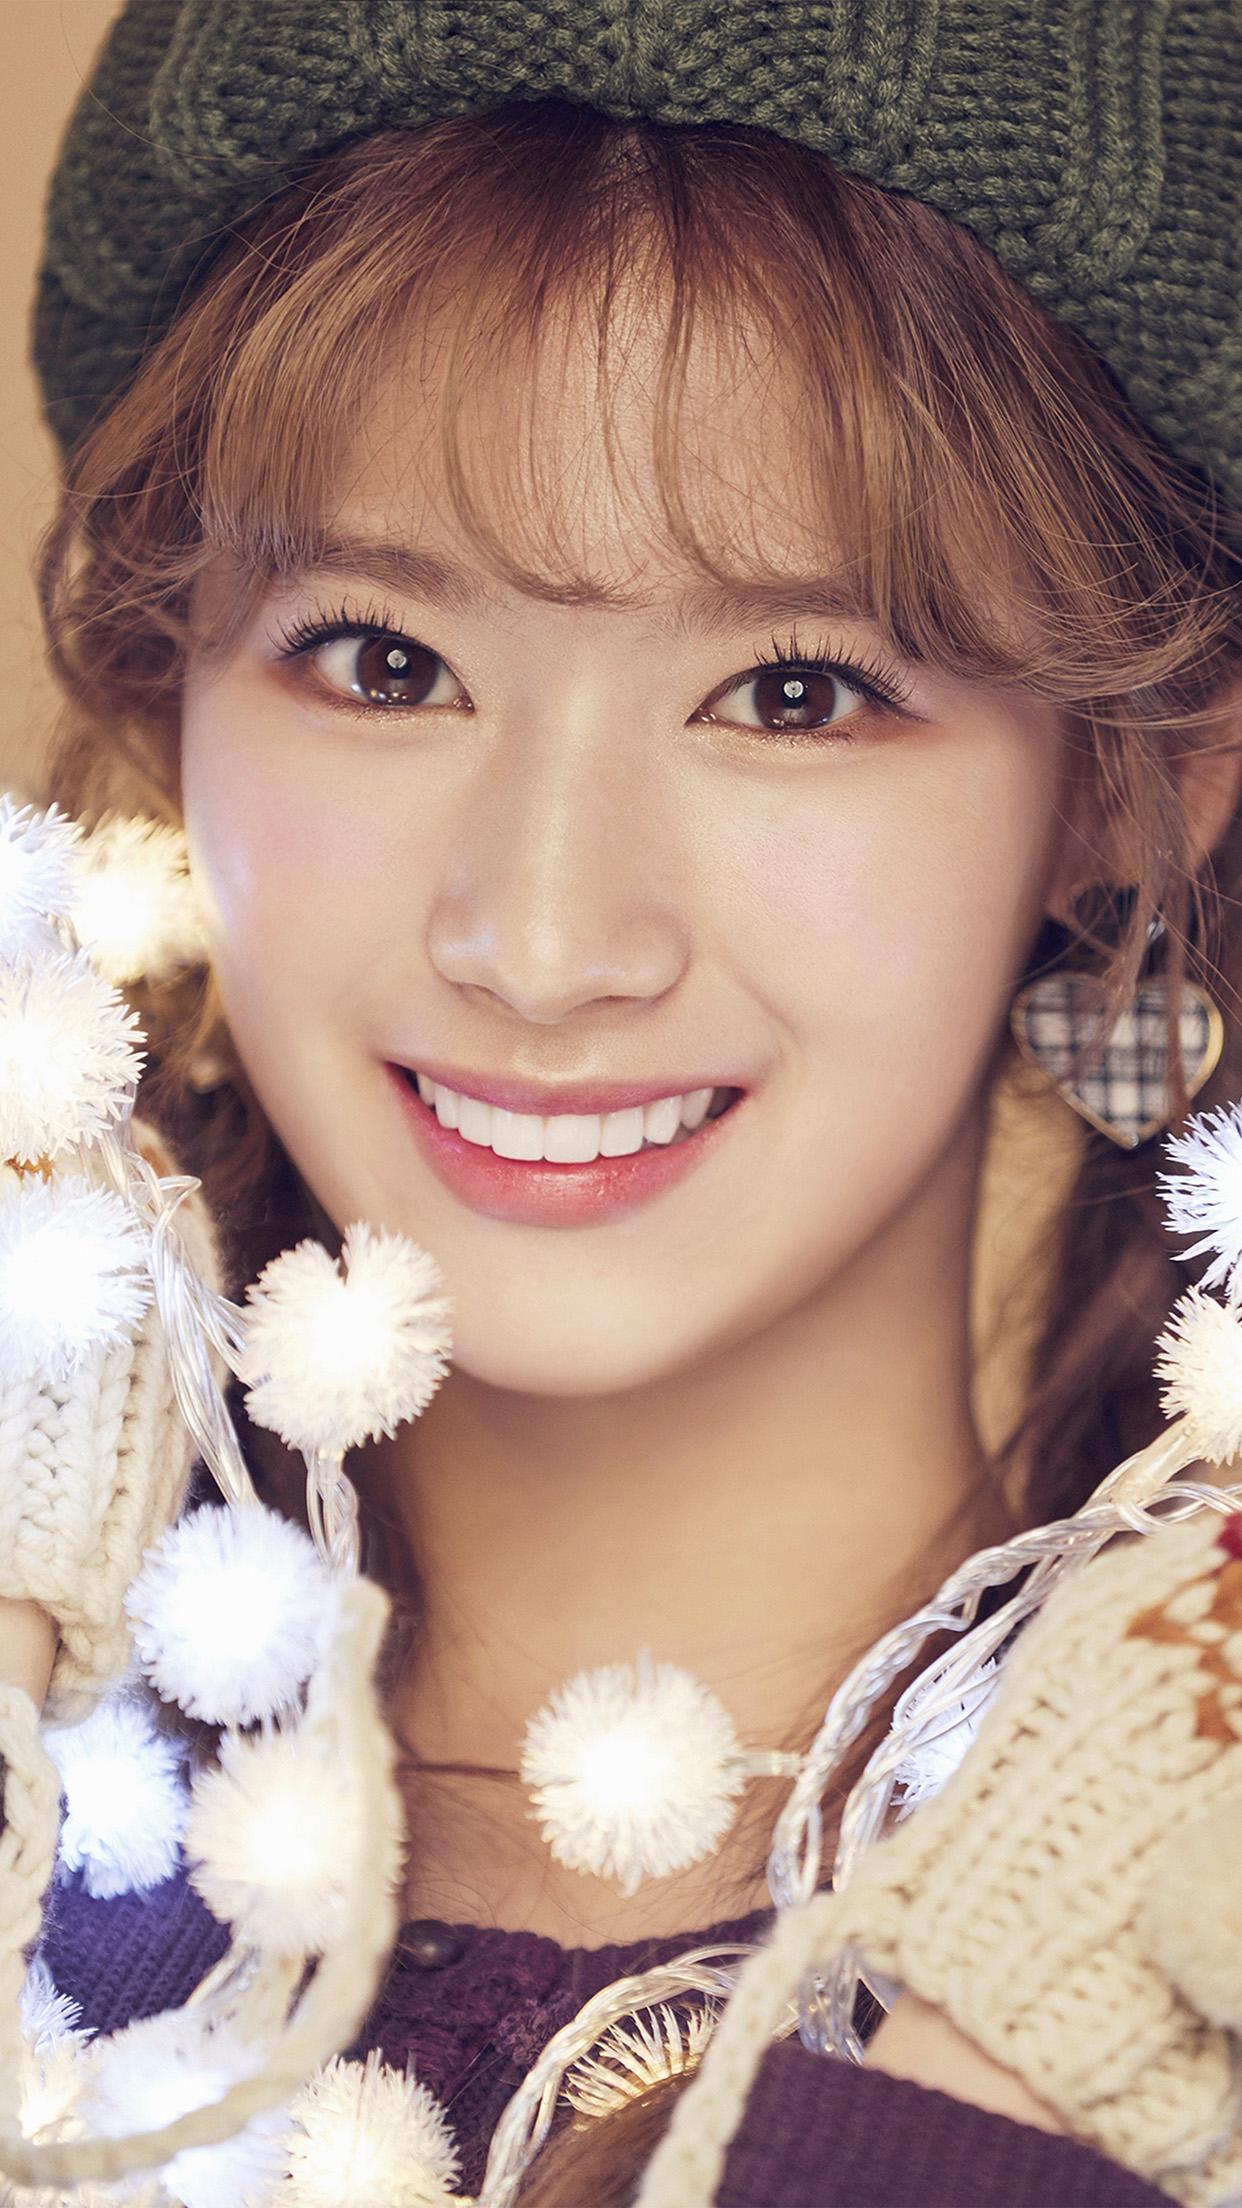 Small Cute Girl Wallpaper Ho97 Kpop Twice Sana Girl Asian Wallpaper